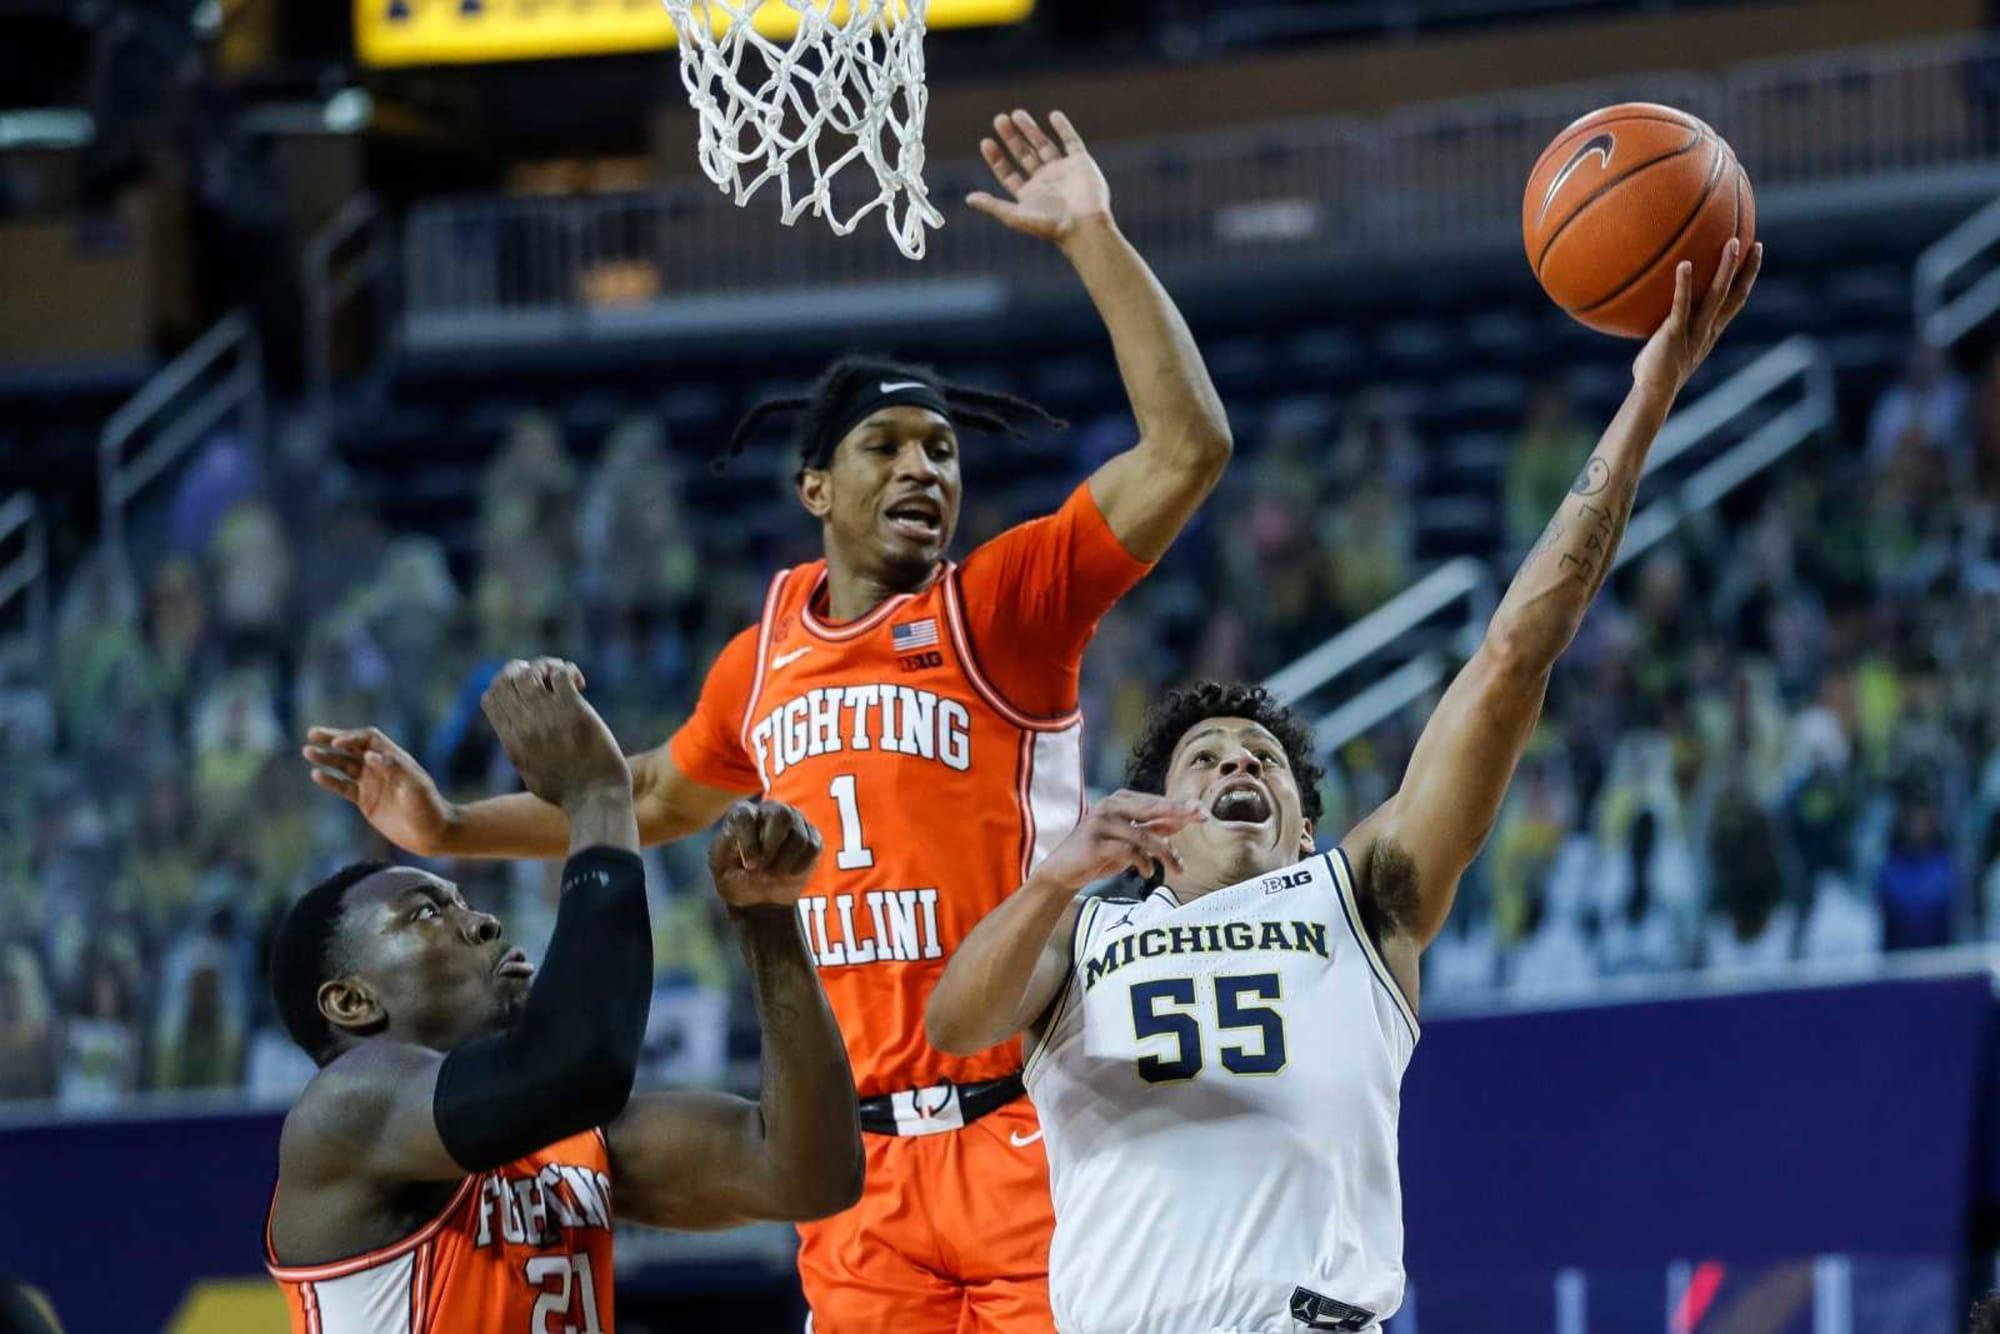 Illinois Basketball: 5 teams the Illini need to play in the NCAA tournament